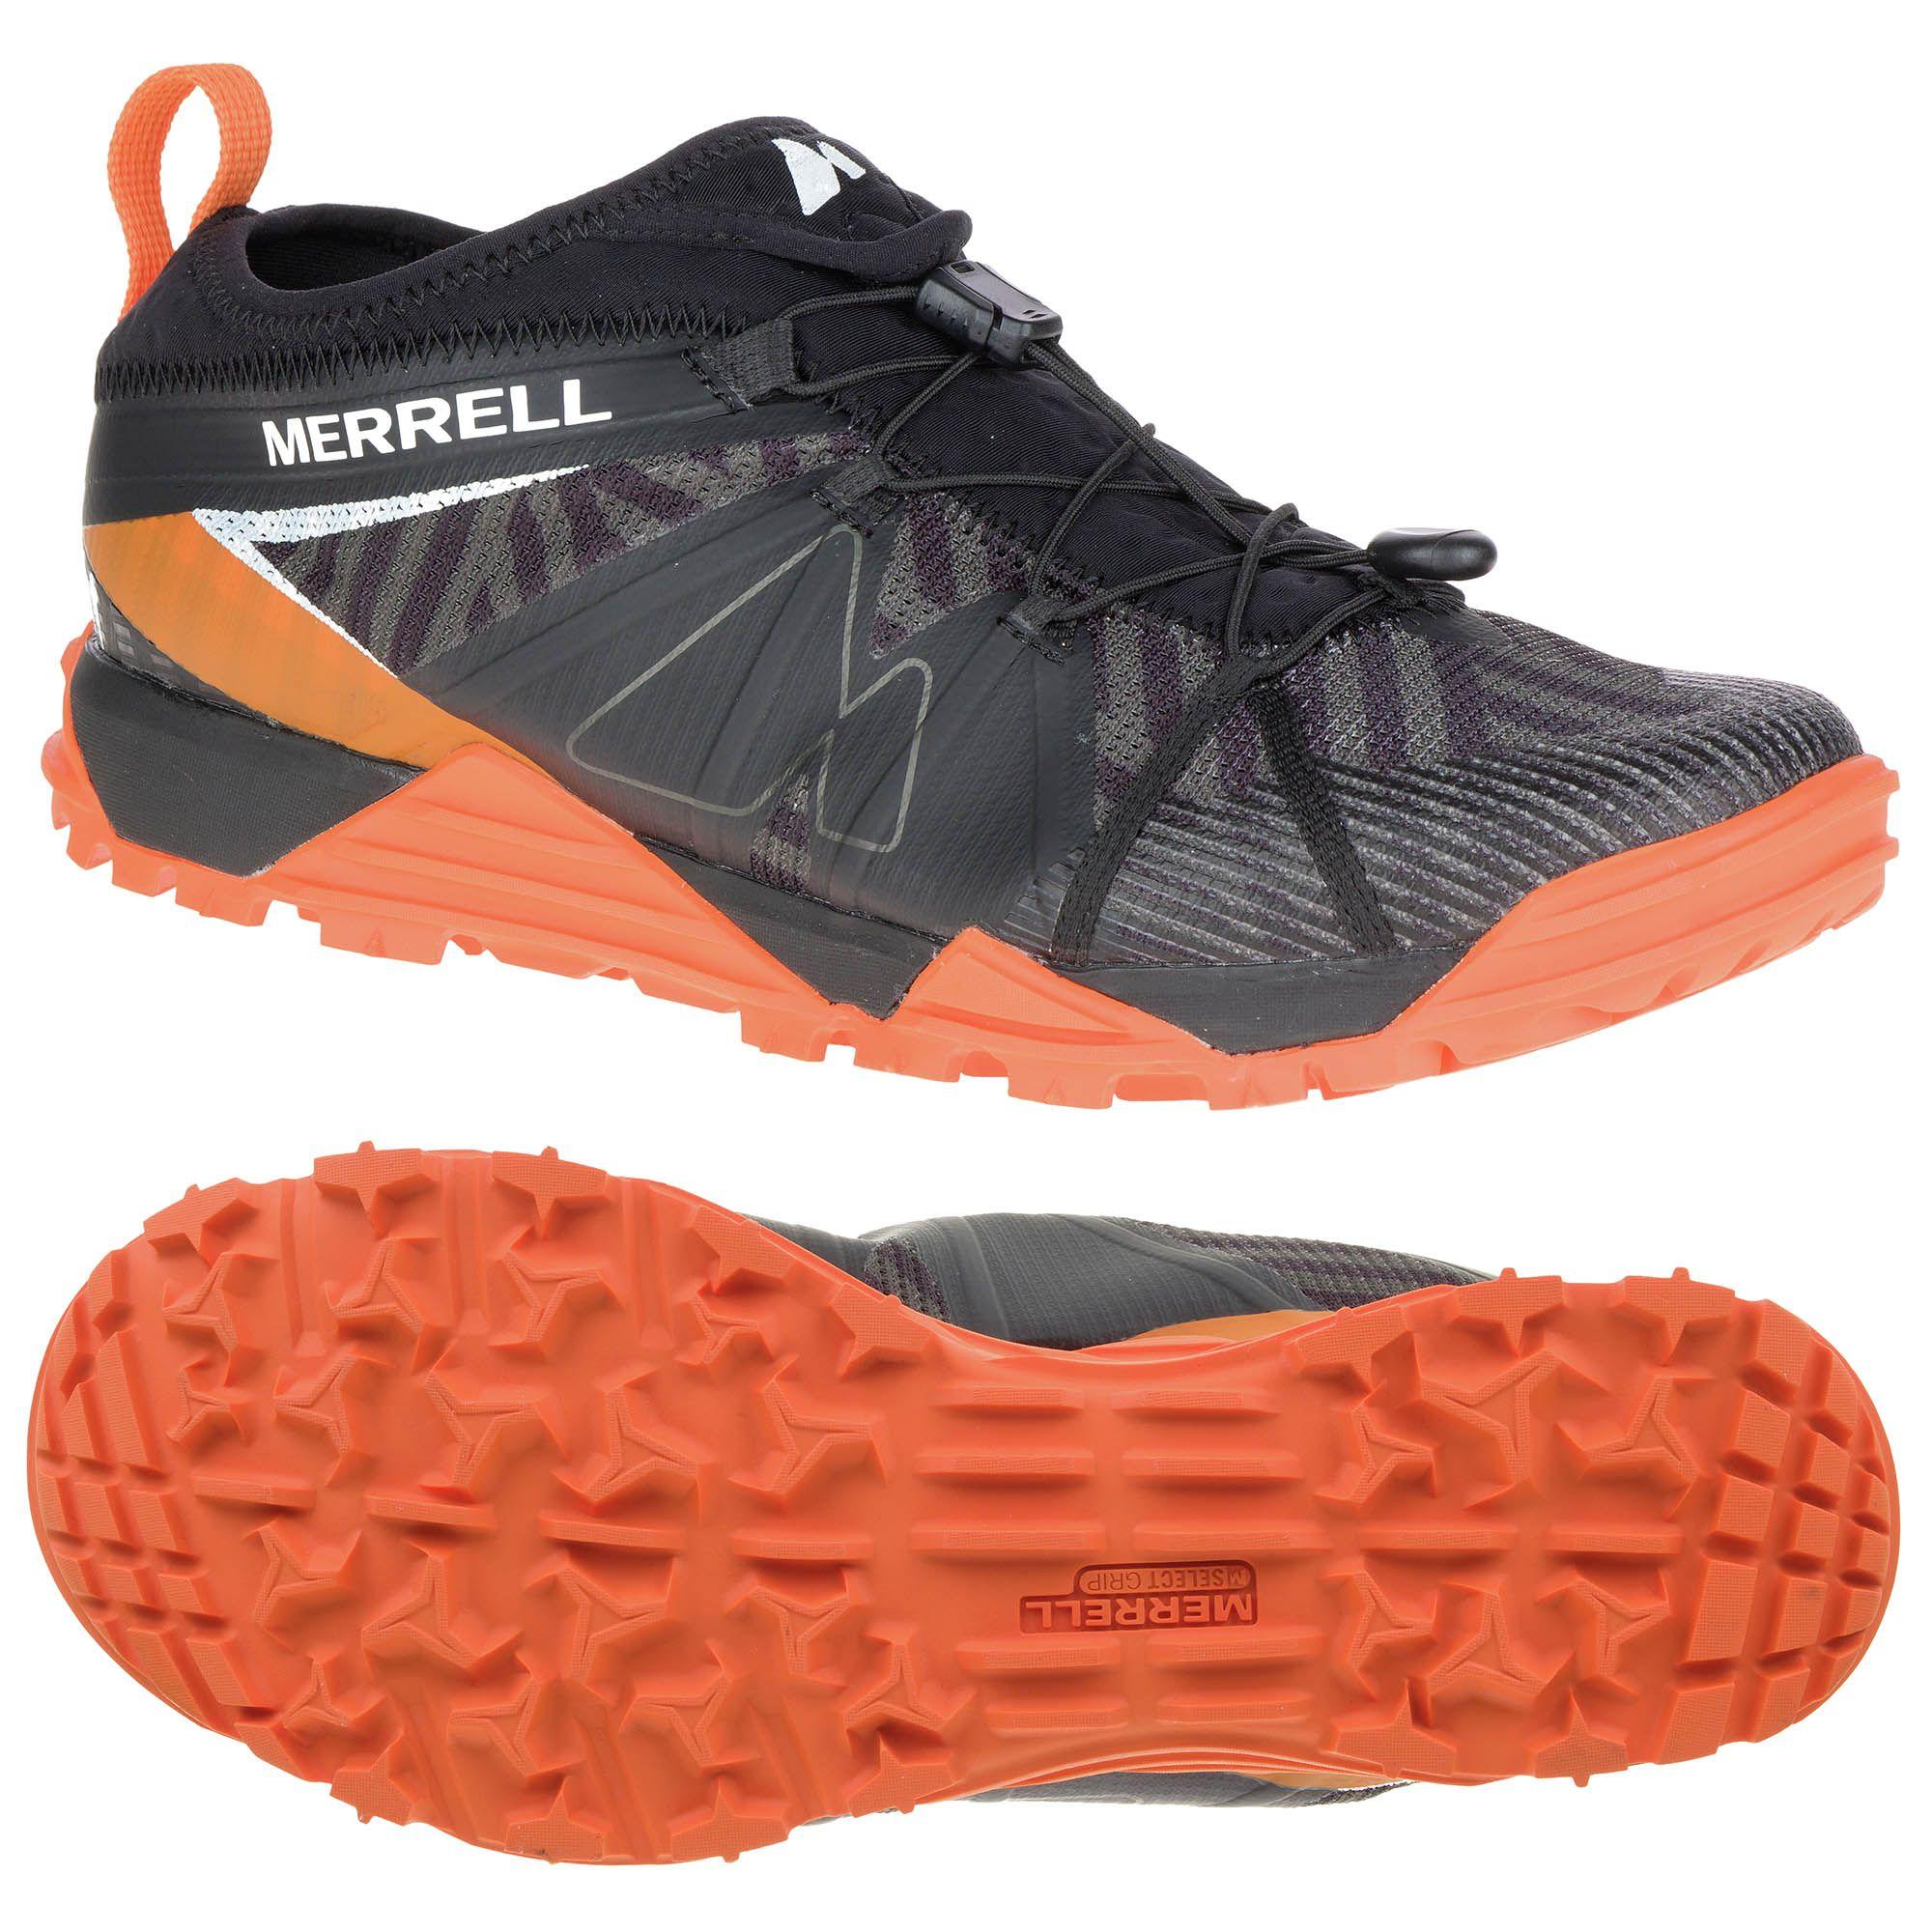 Merrell New Mudder Shoes